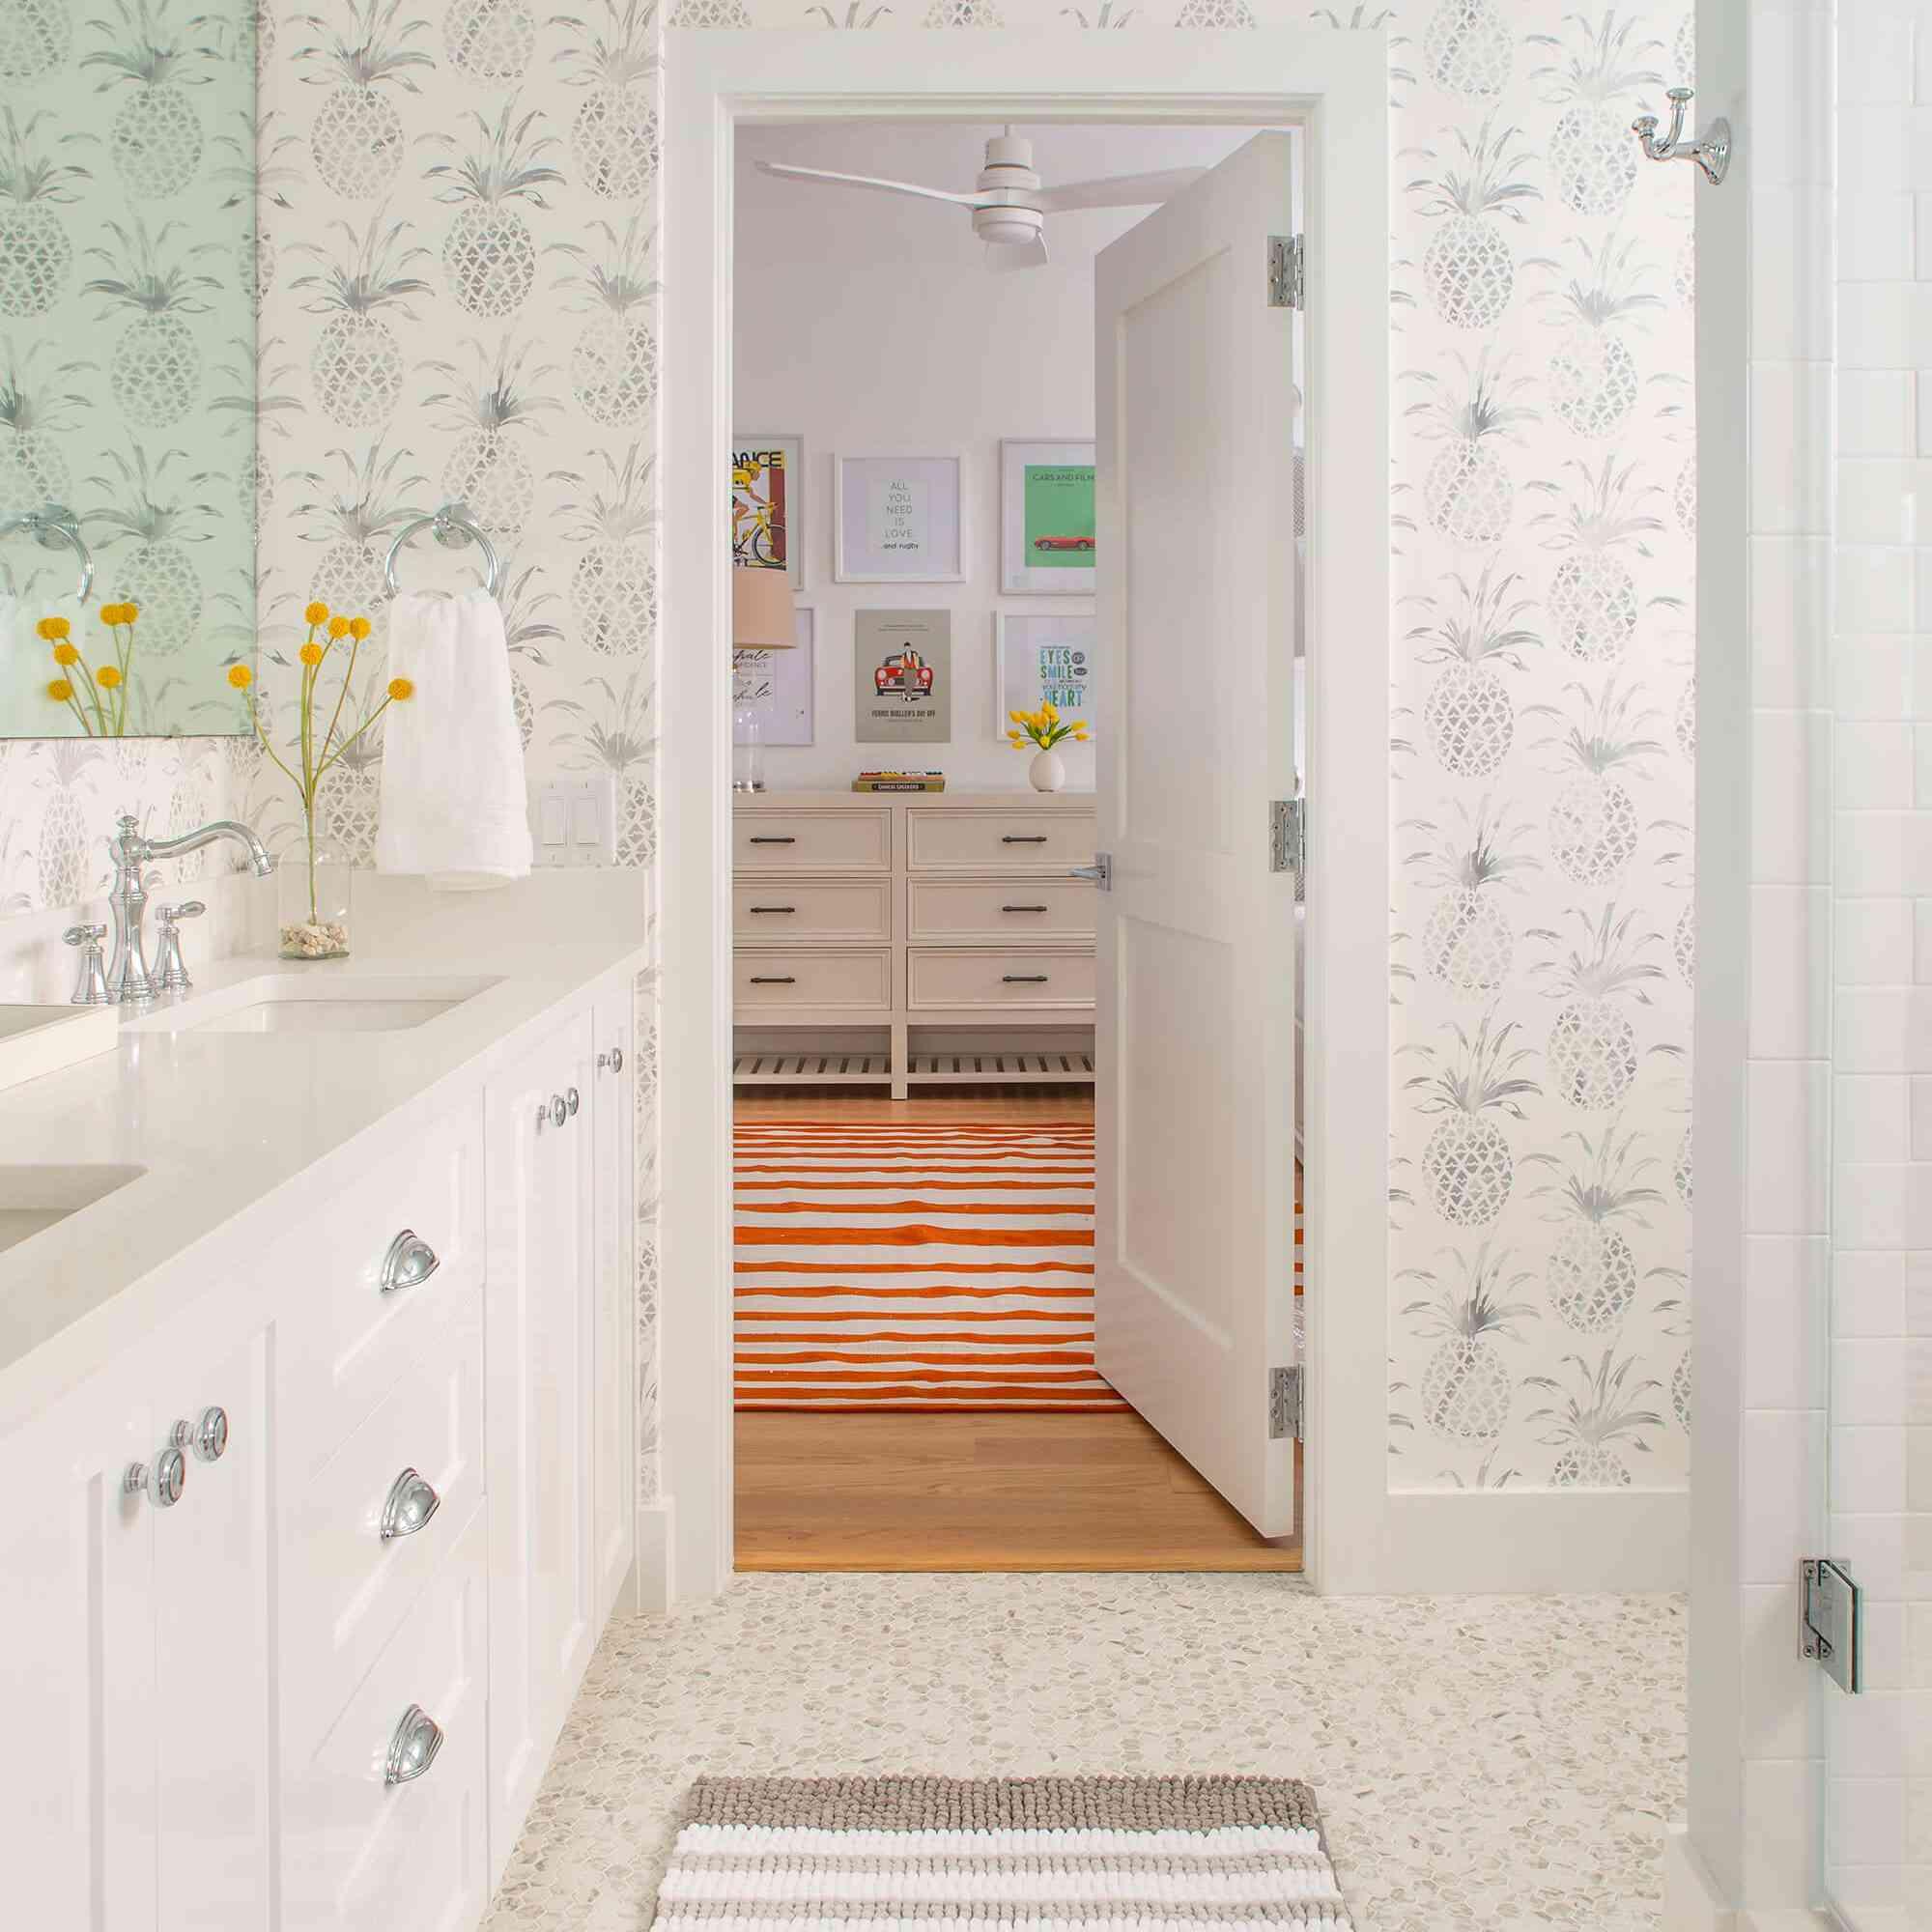 Subtle tropical bathroom with wallpaper